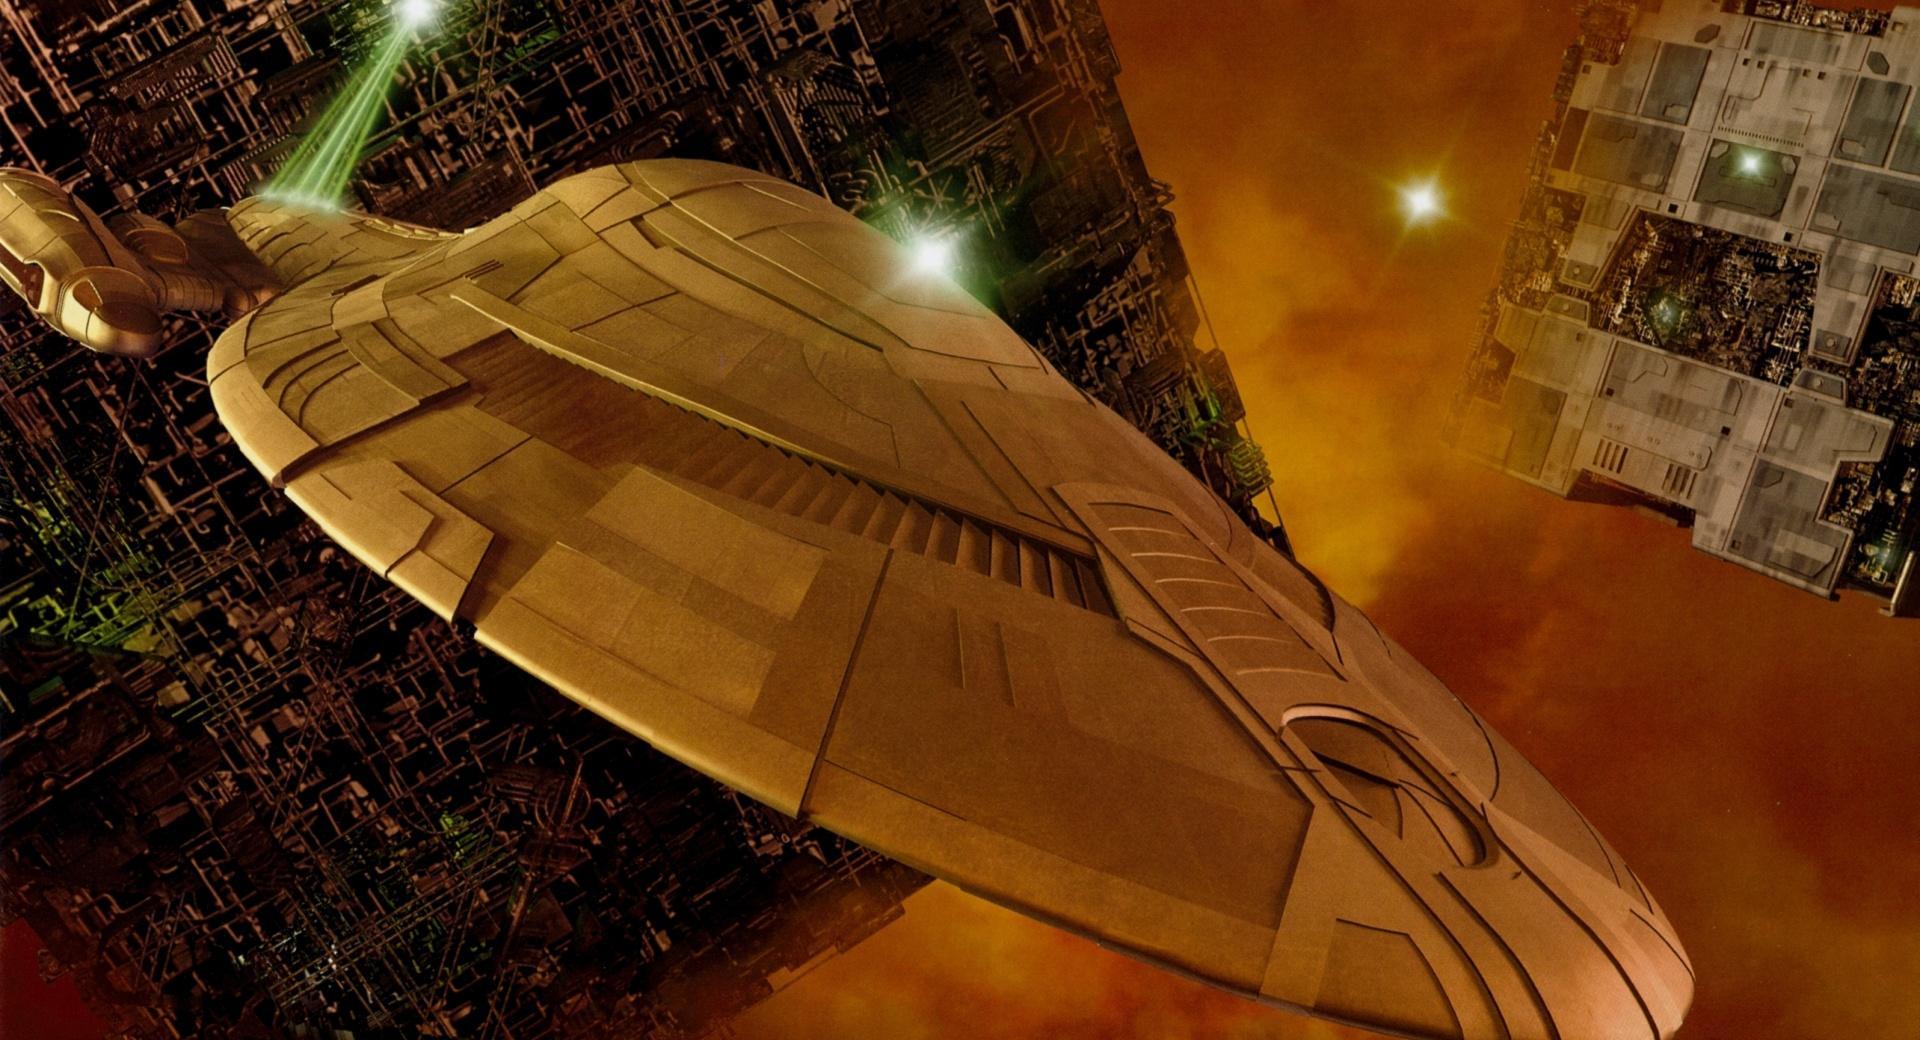 Star Trek The Borg wallpapers HD quality